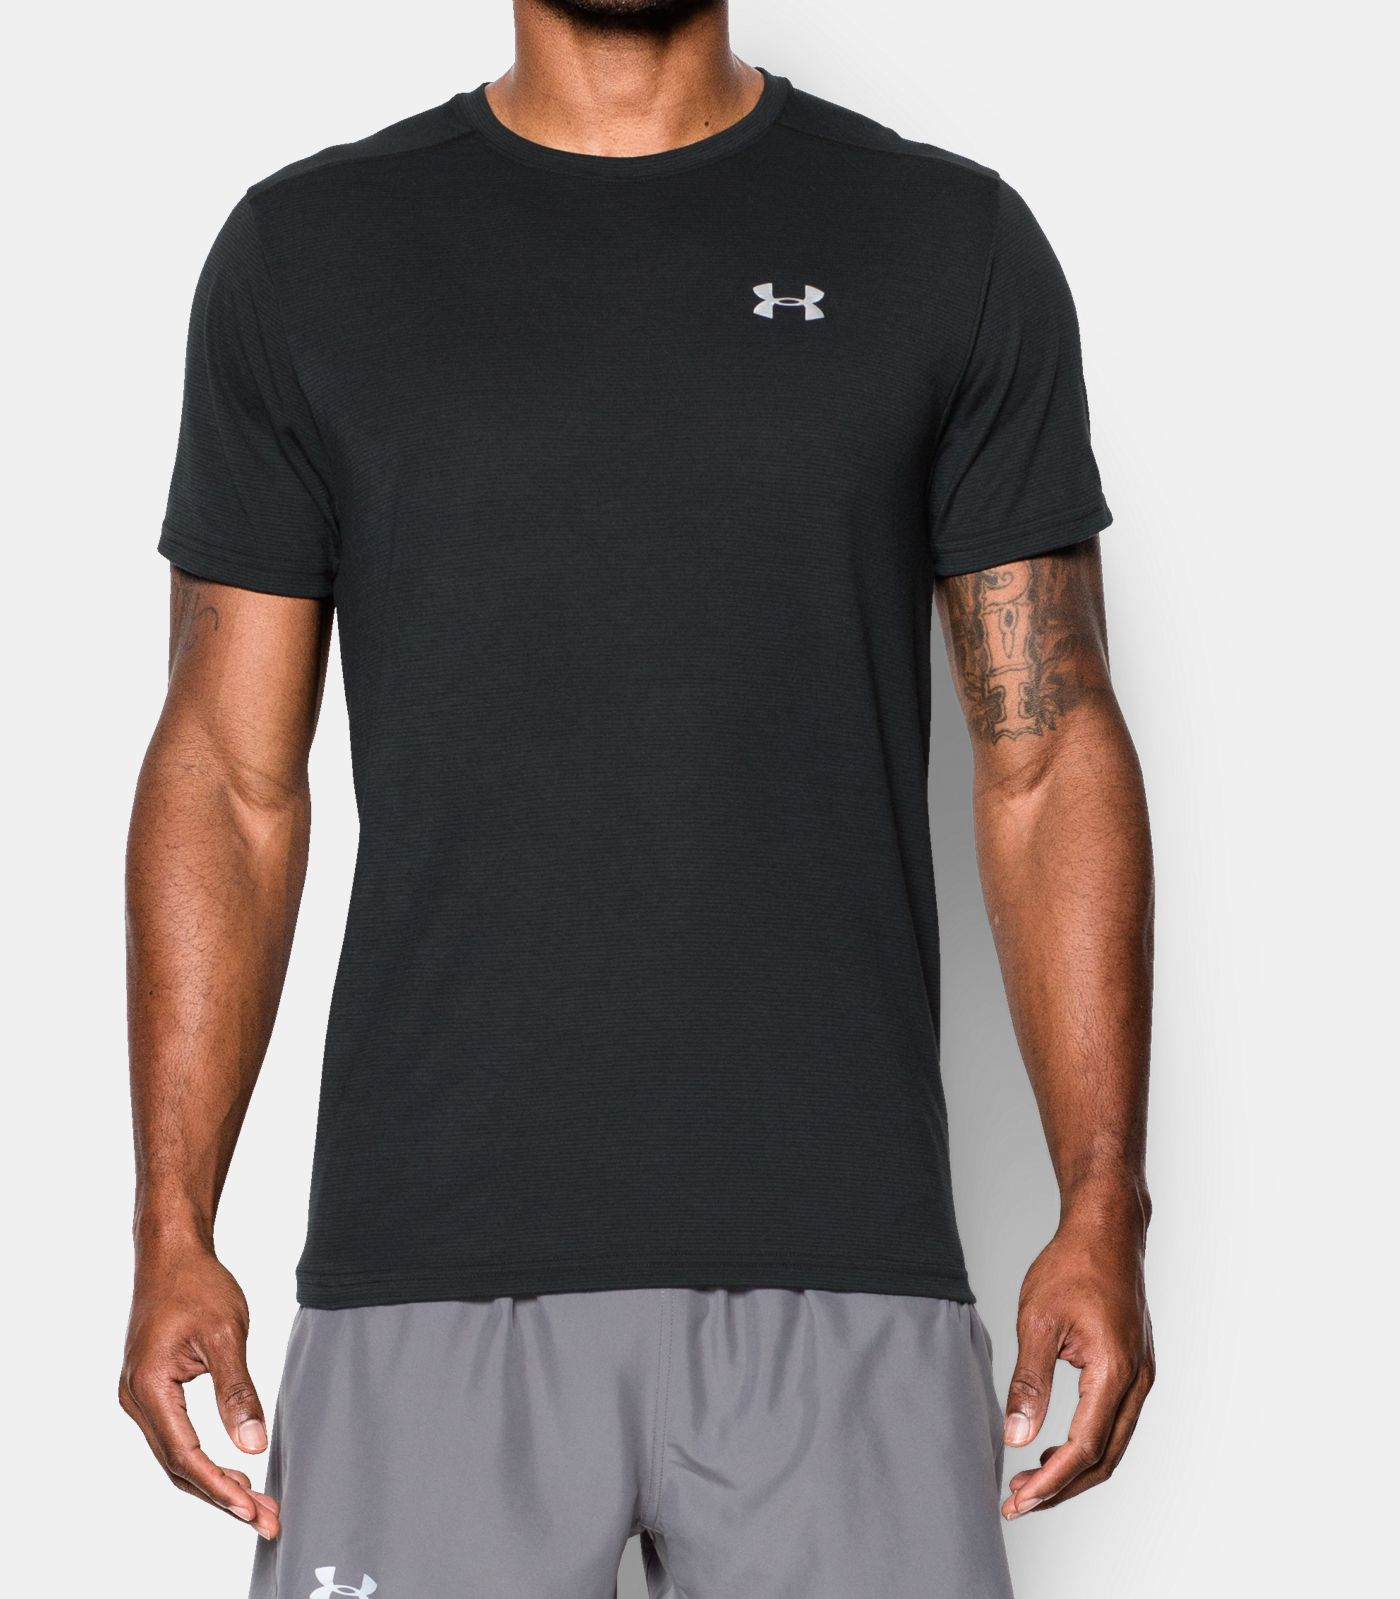 99a8fe05 Under Armour Men's UA Threadborne Streaker Short Sleeve in 2019 ...